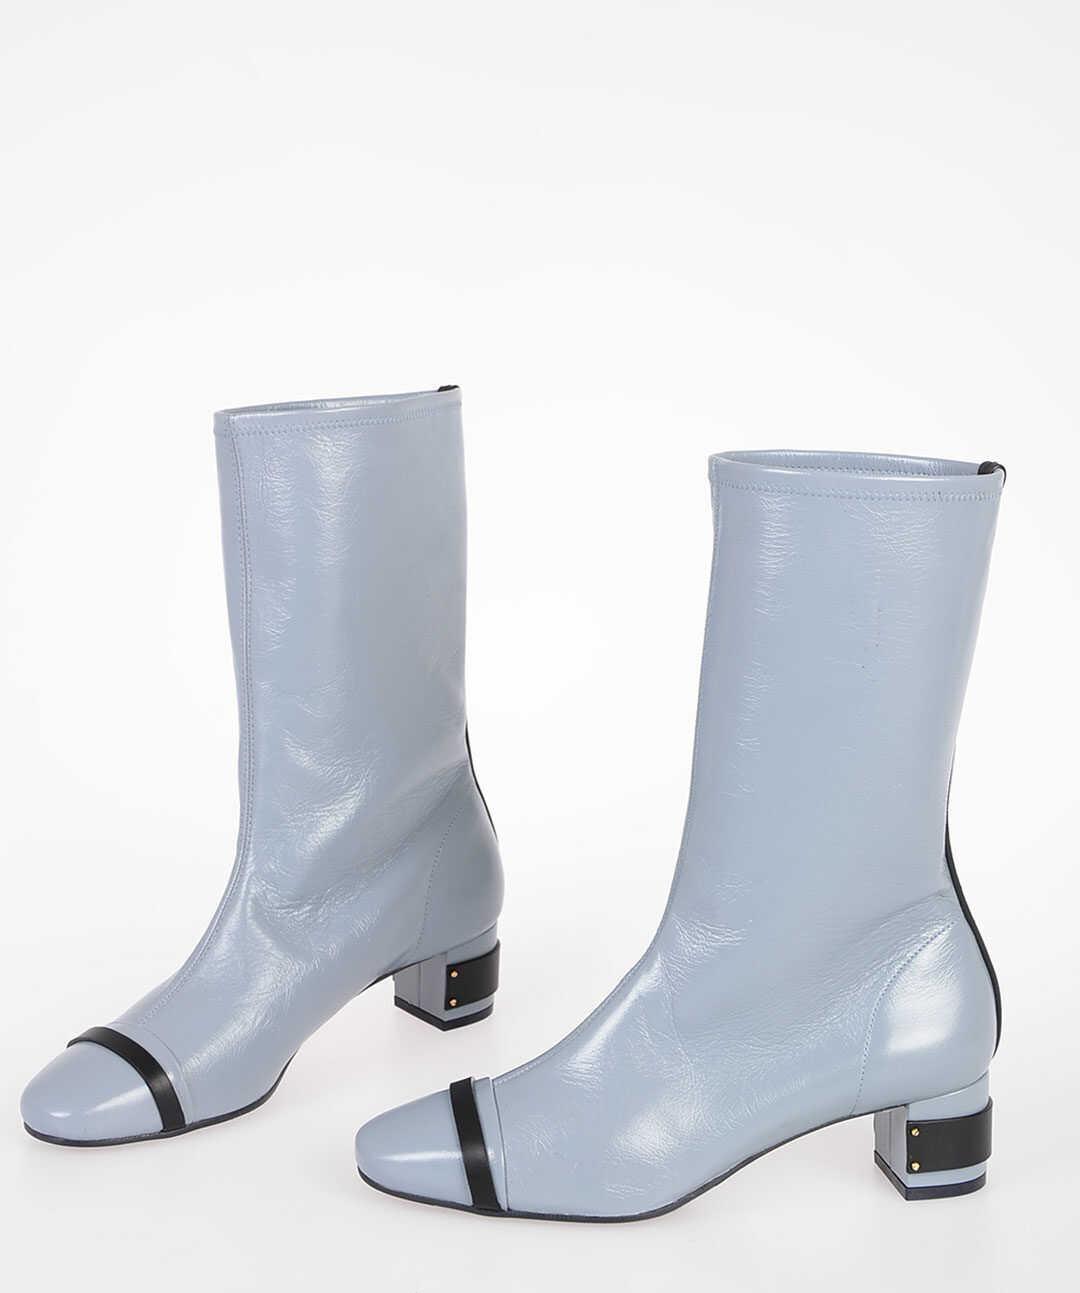 Stuart Weitzman 5cm Leather BECKETT Boots GRAY